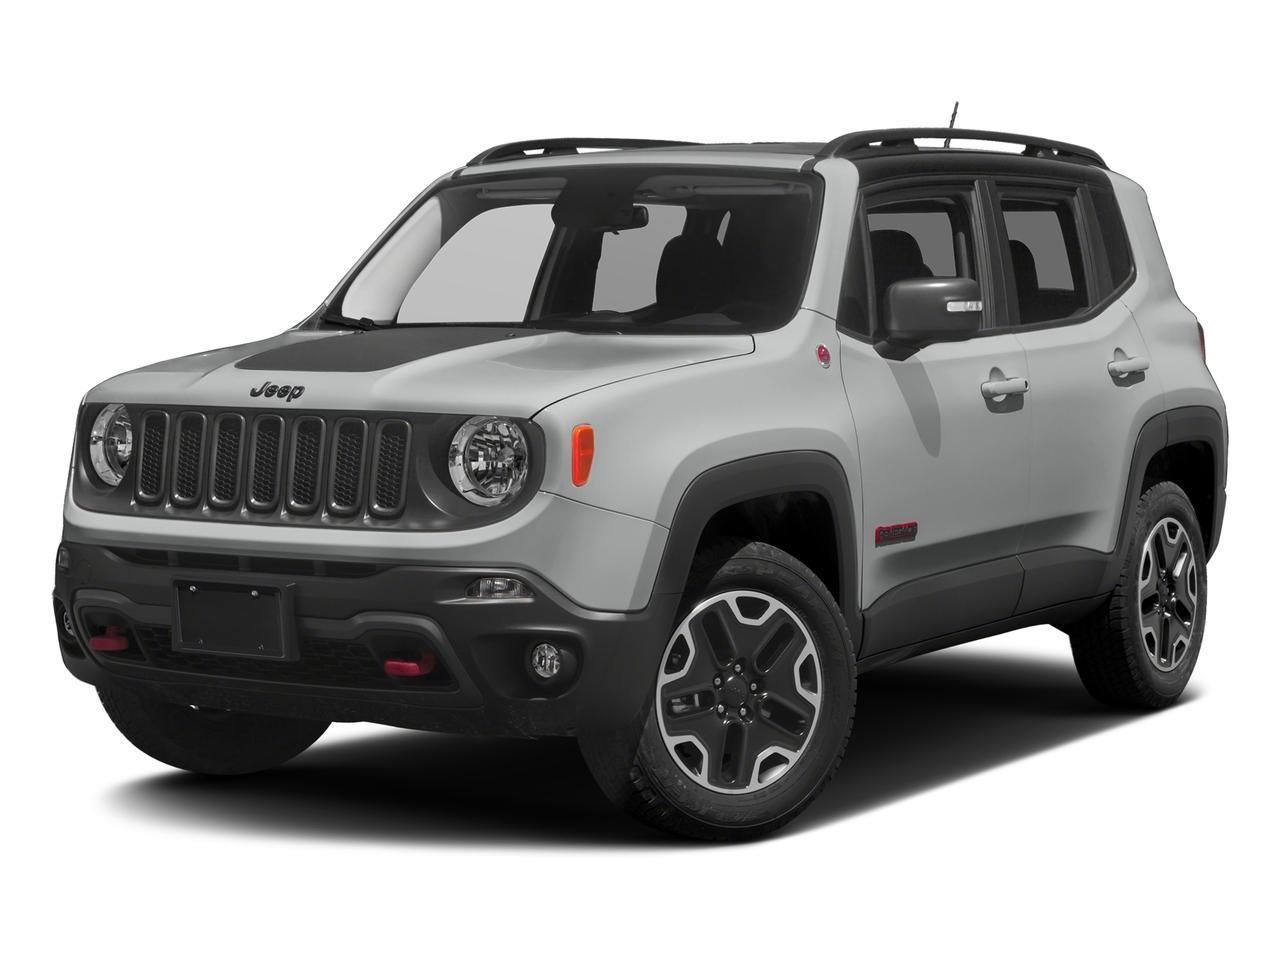 2017 Jeep Renegade Vehicle Photo in Colorado Springs, CO 80905